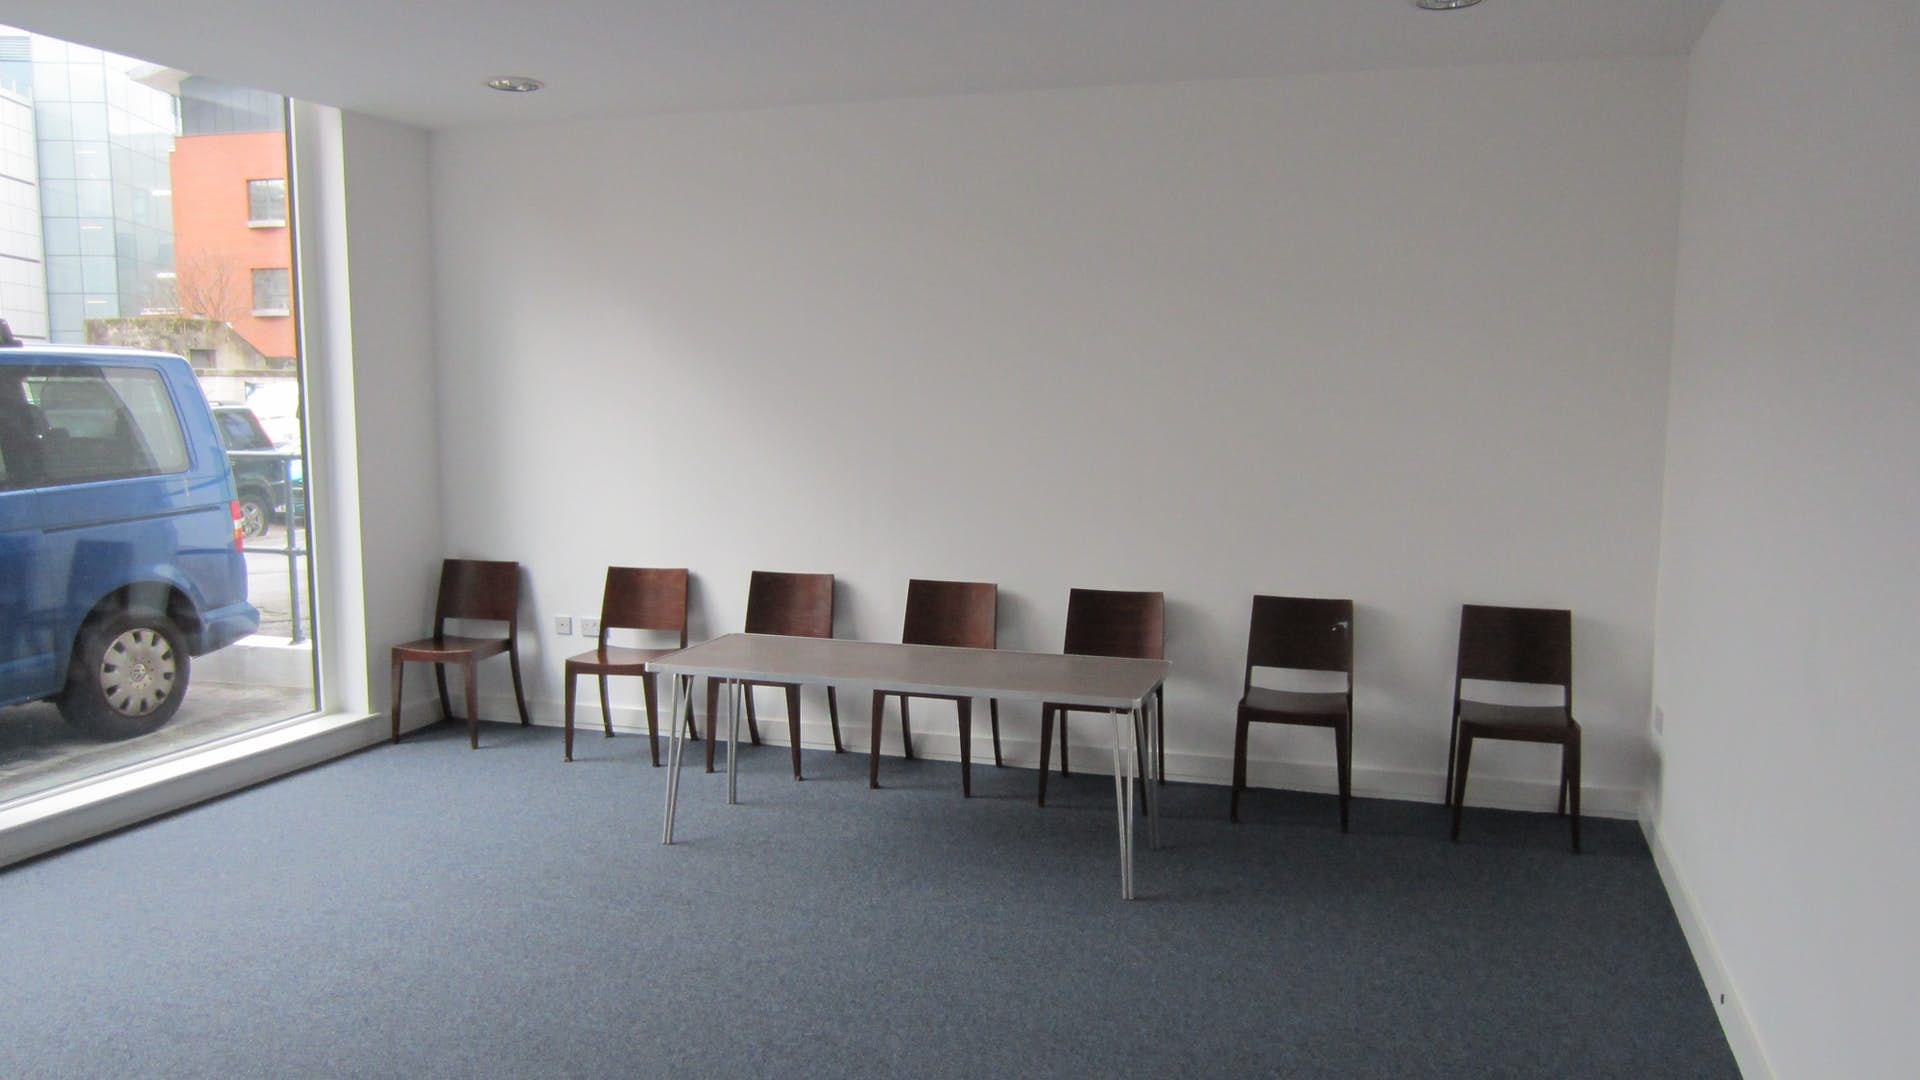 Hackney Meeting Room Hire